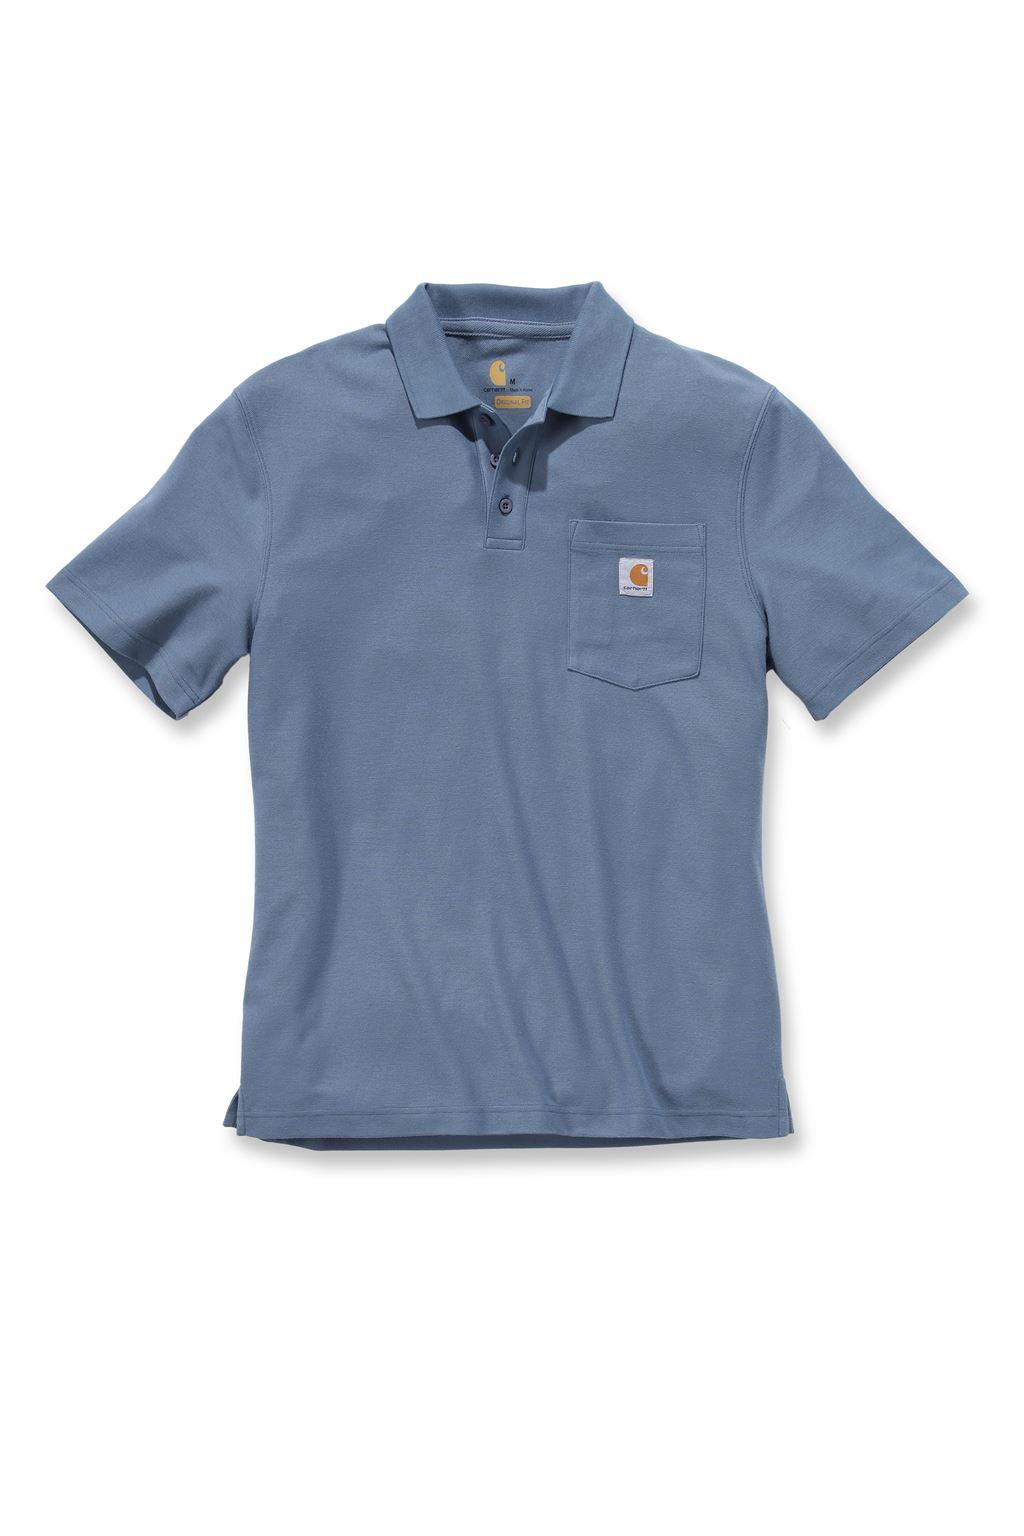 Carhartt k570 work pocket short sleeve polo shirt steel for Short sleeve polo shirt with pocket